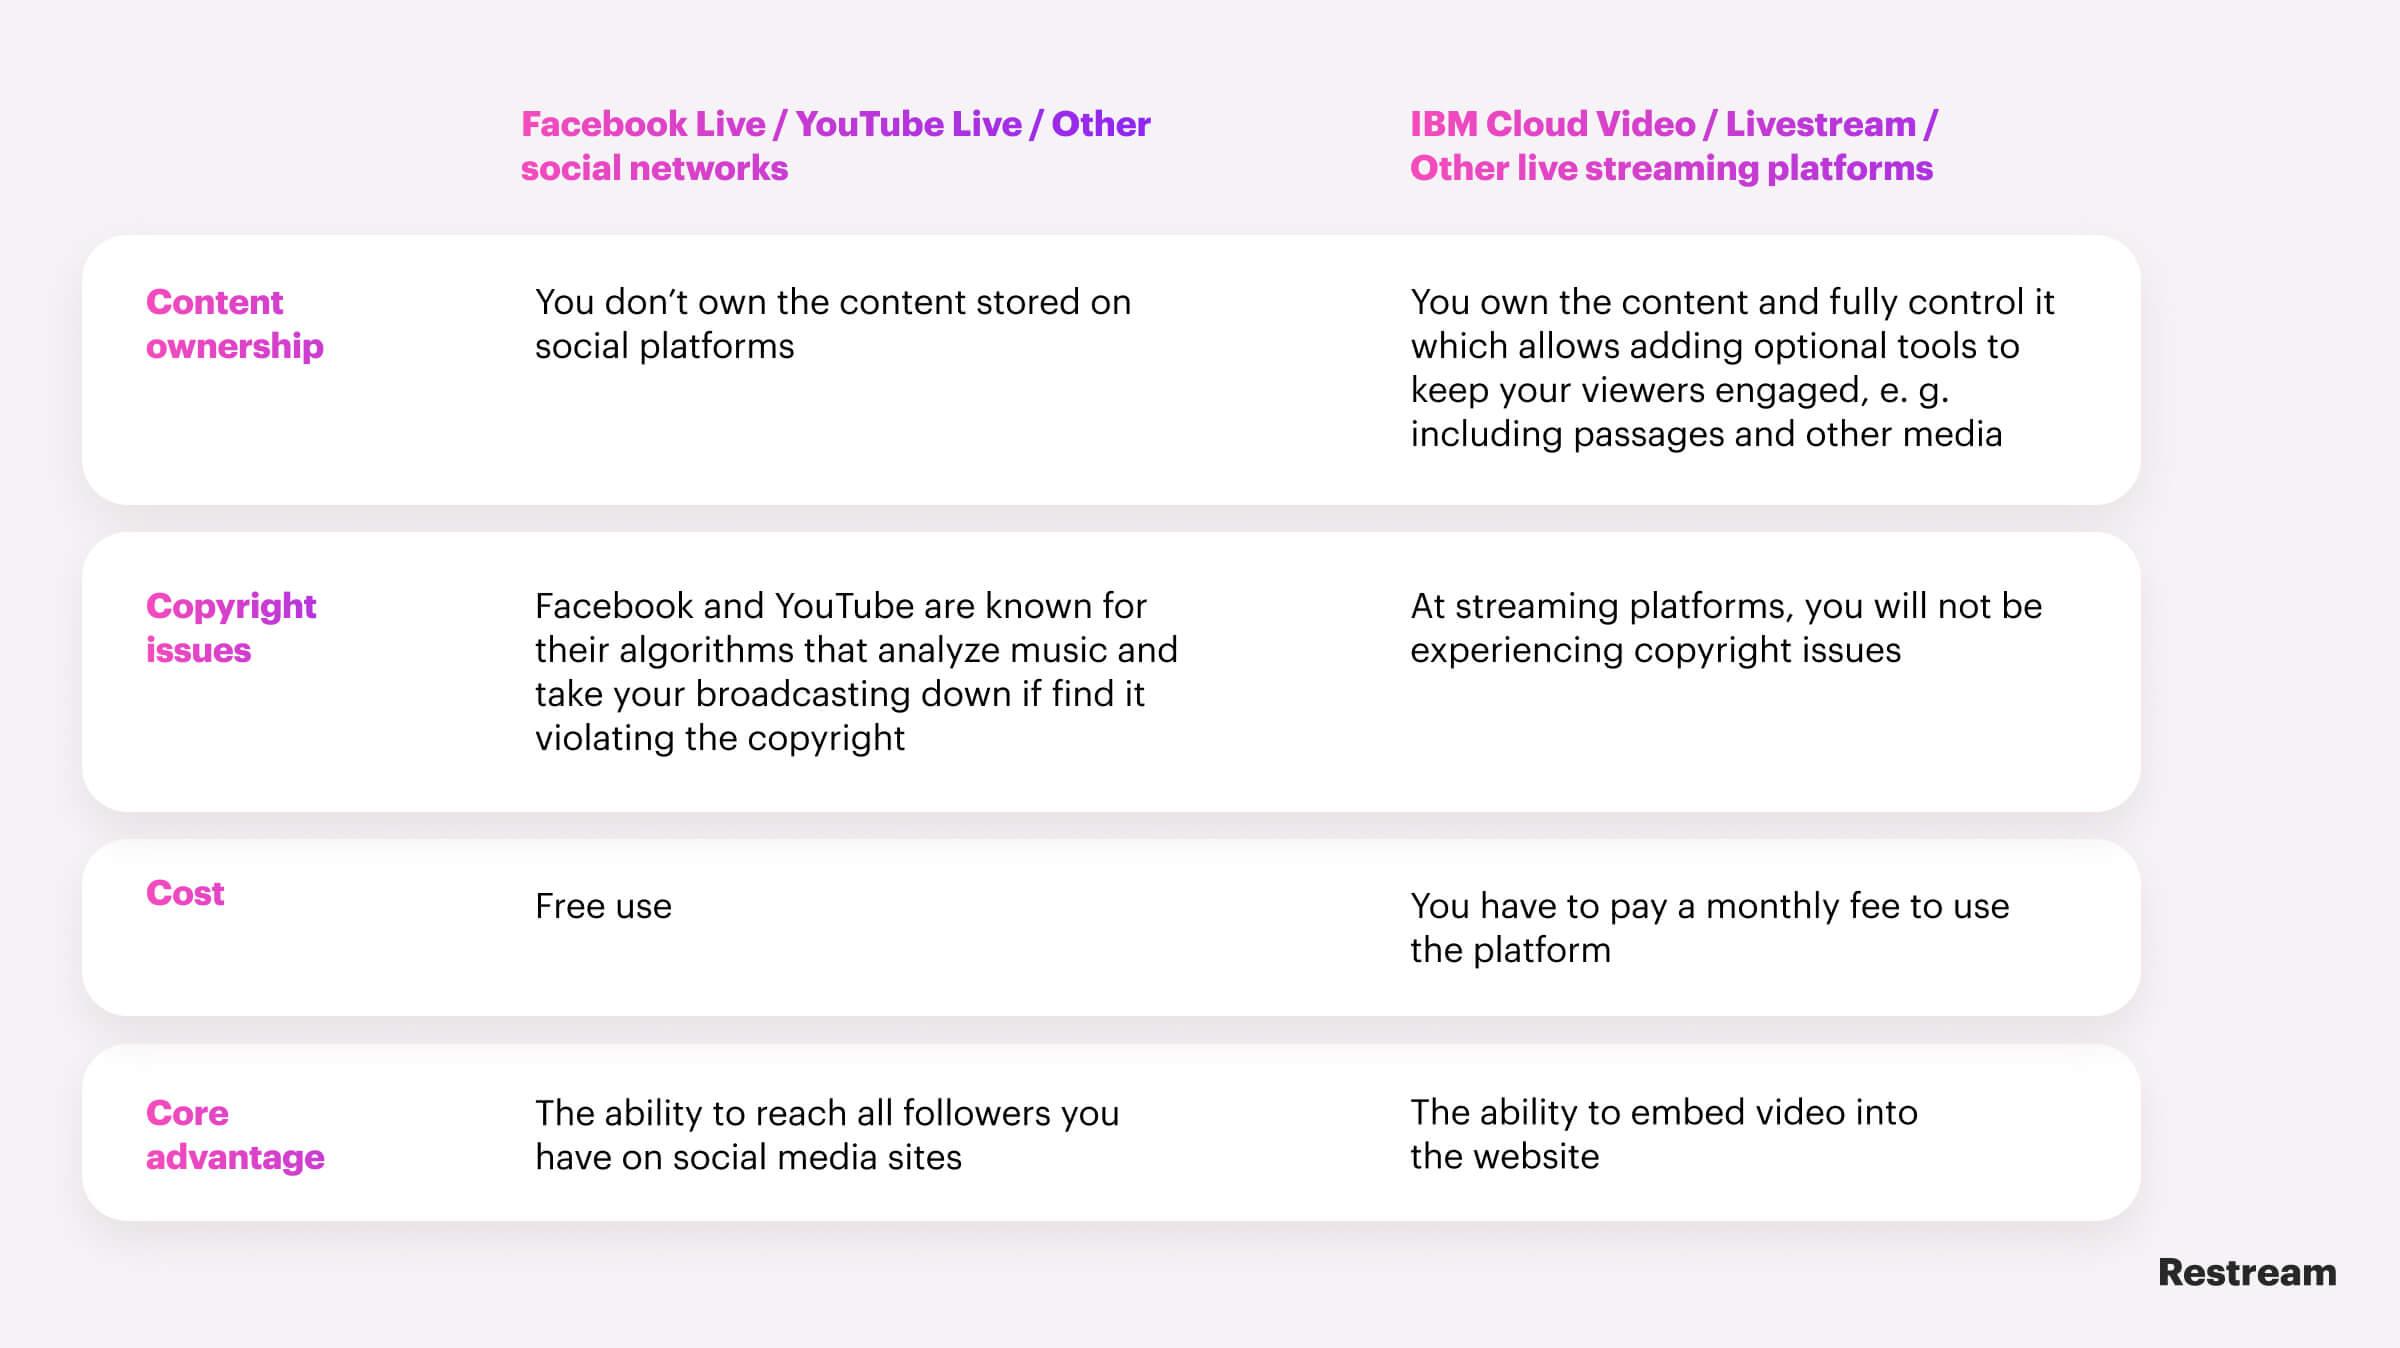 Social networks vs streaming platforms